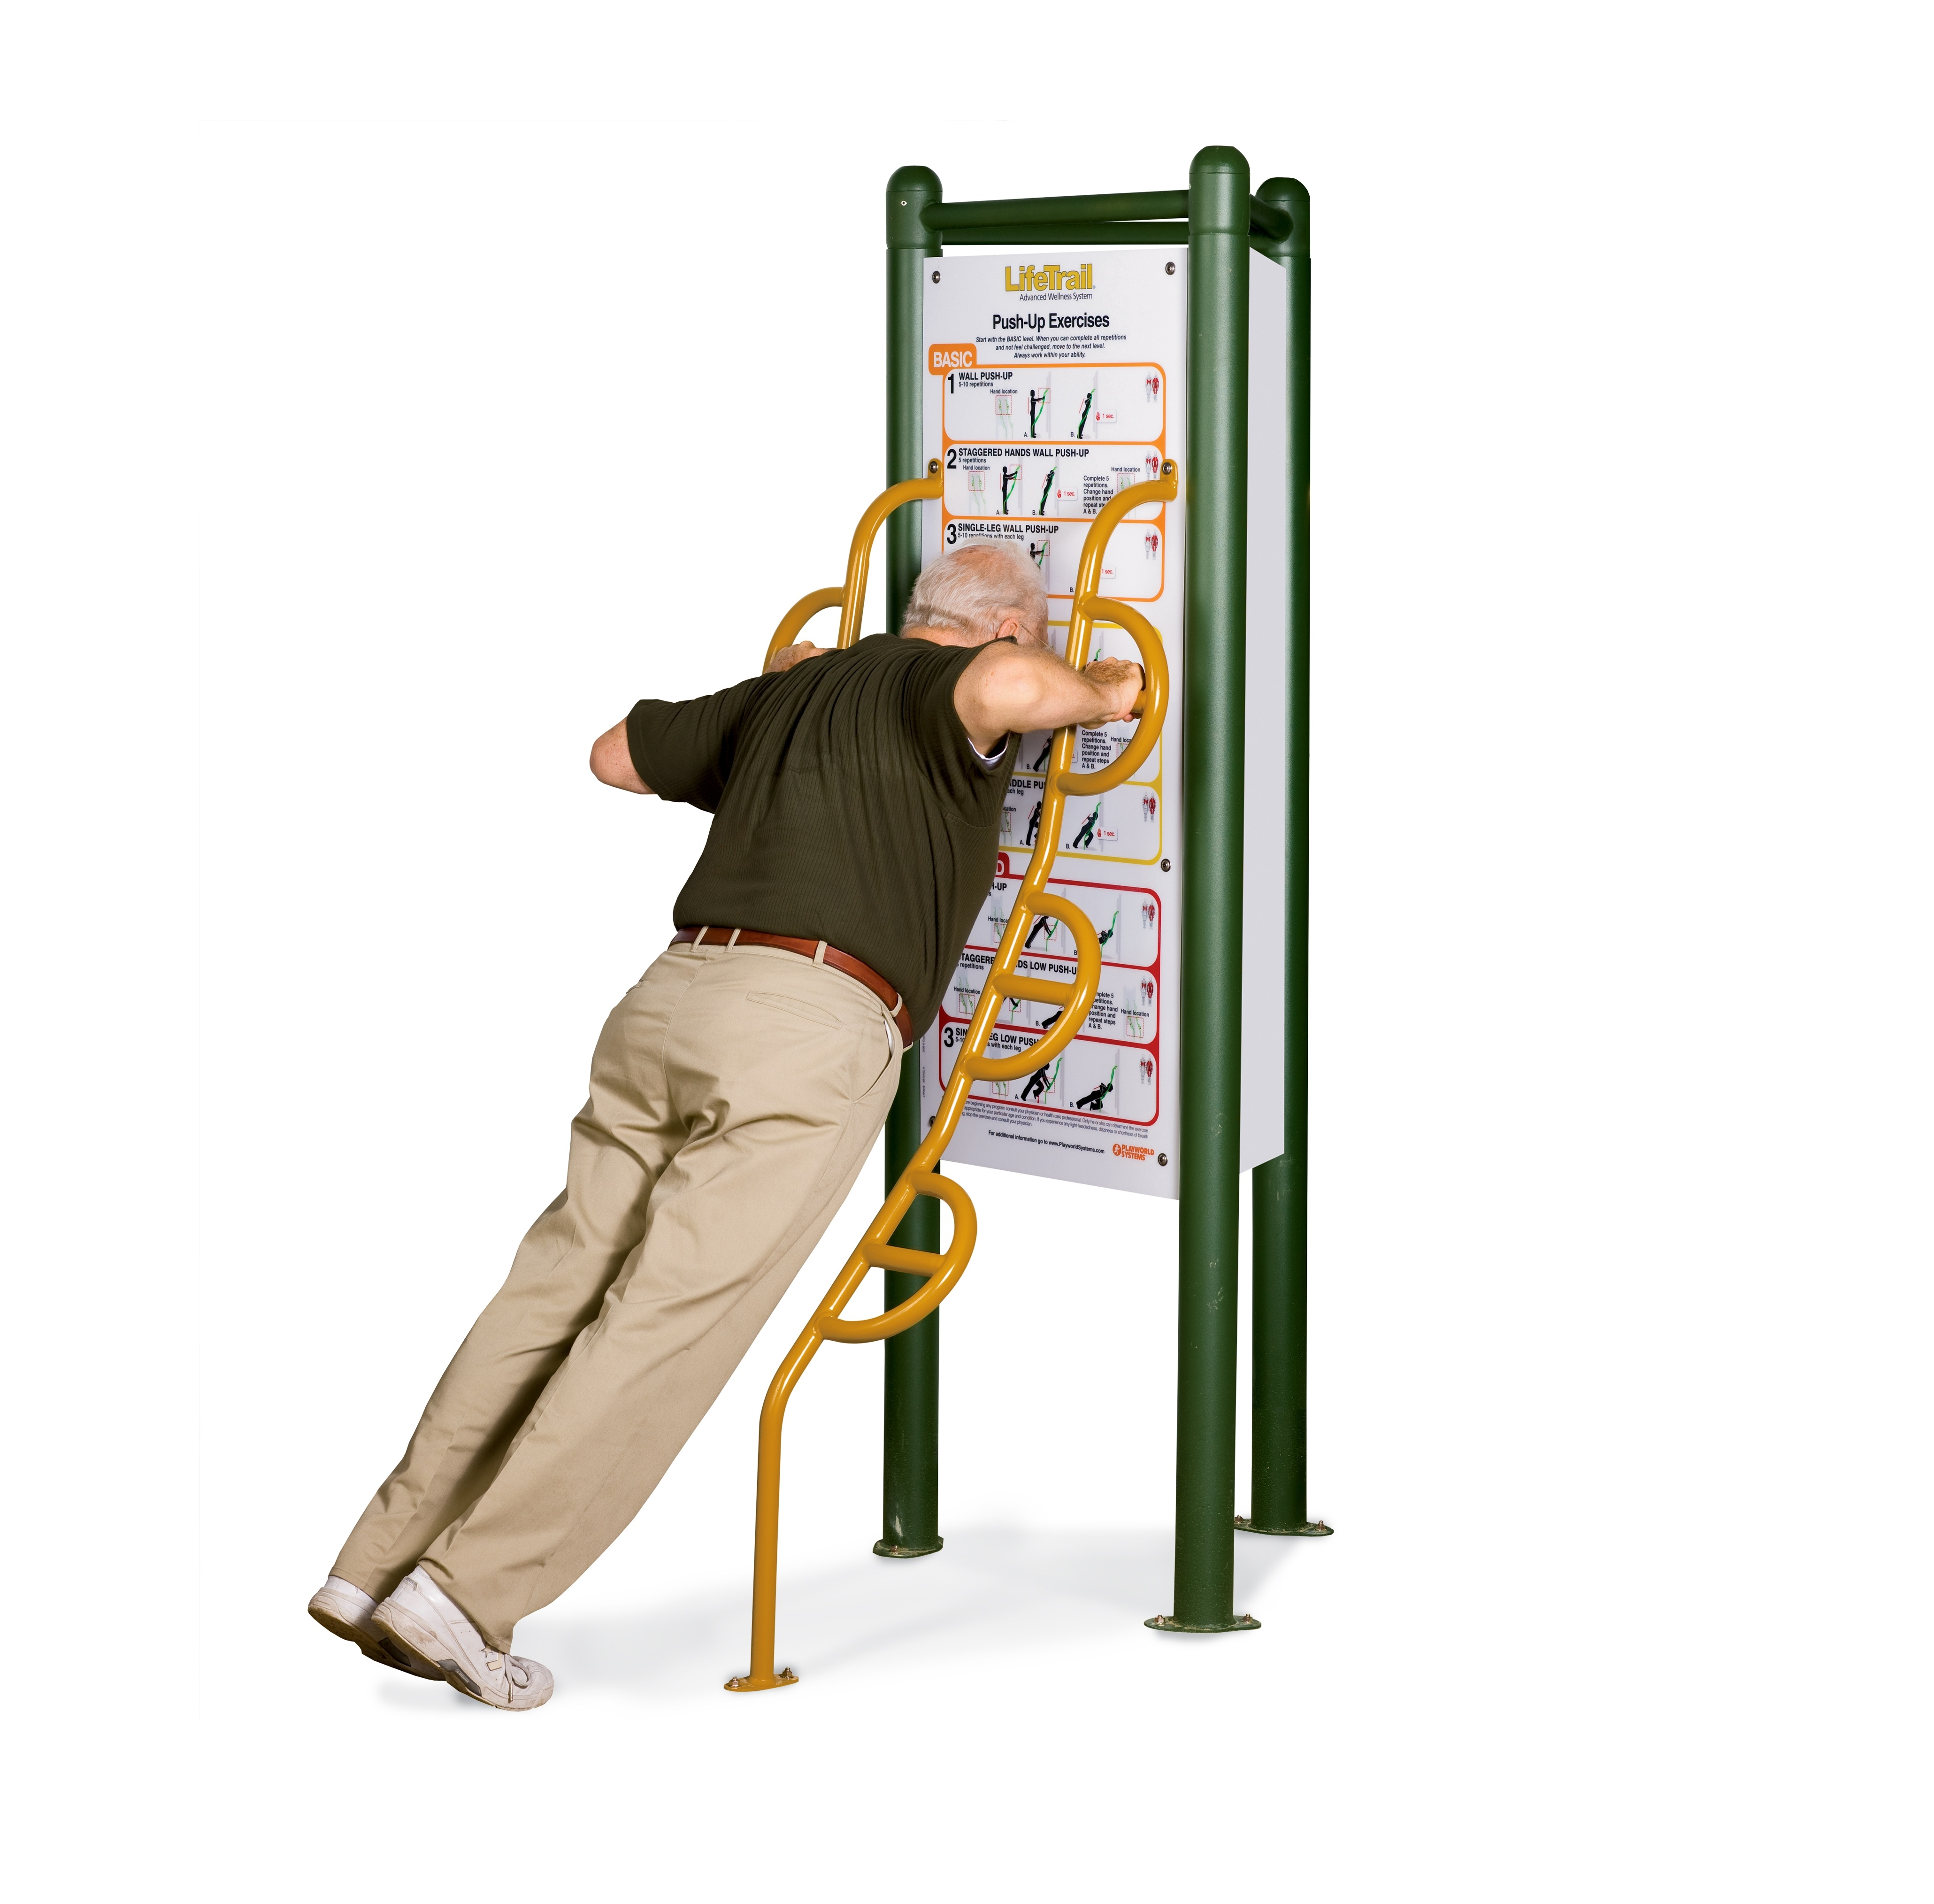 Exercices de pompes